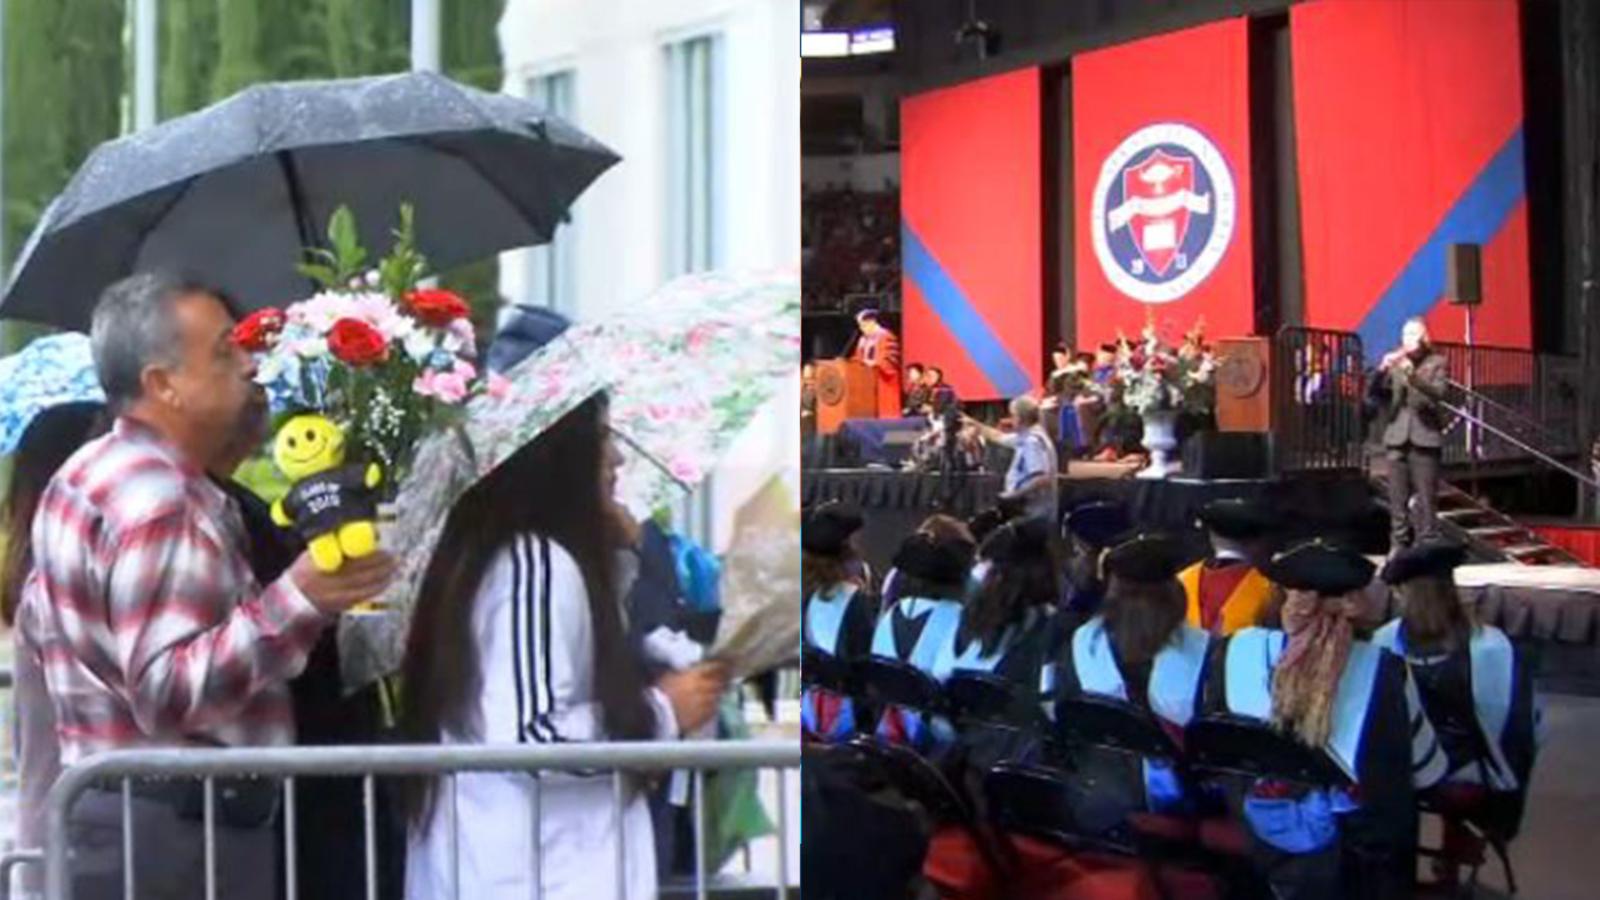 No rain on this parade: Fresno State graduates celebrate commencement rain or shine